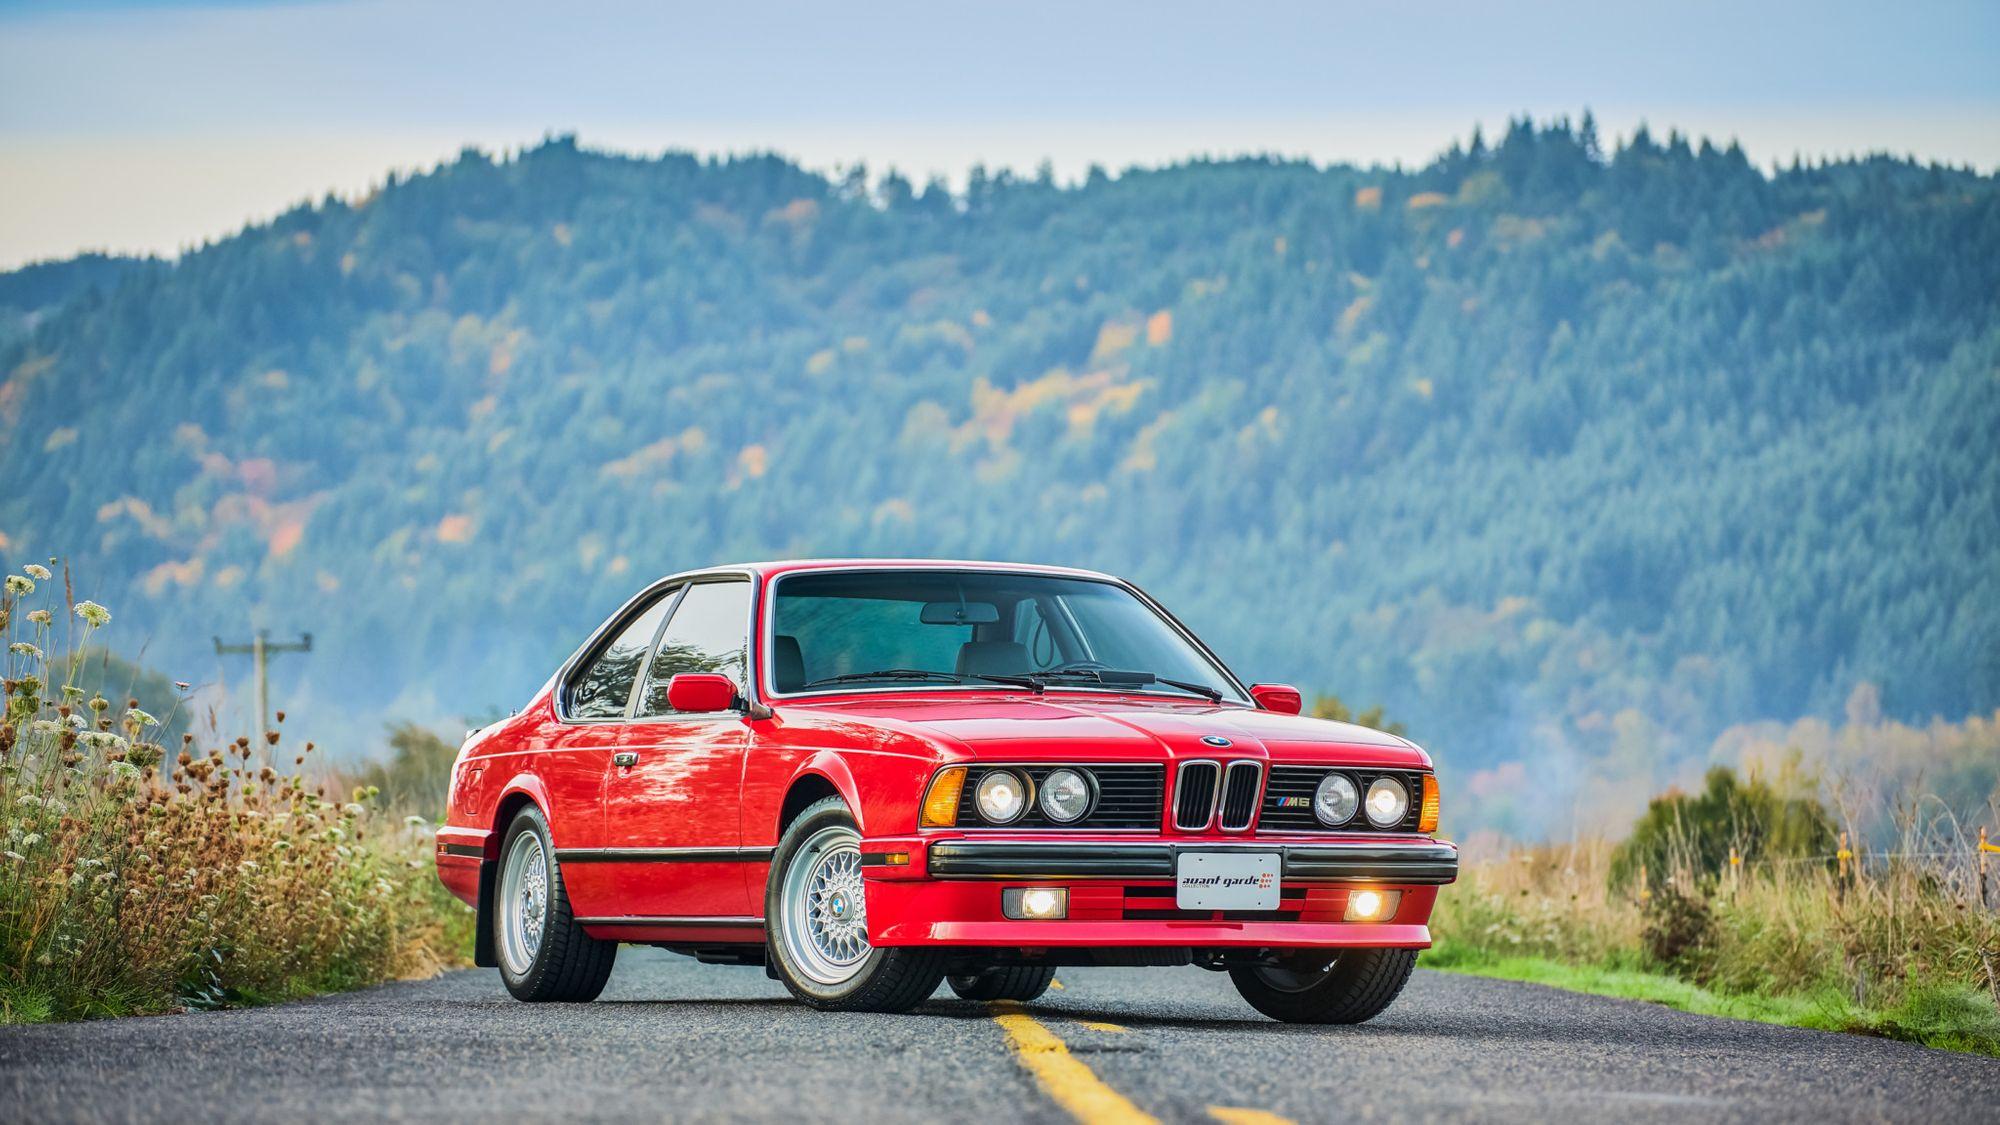 Apakah anda sedang mencari ban bmw ? Ride A Unicorn With This Low-Mileage 1988 BMW M6